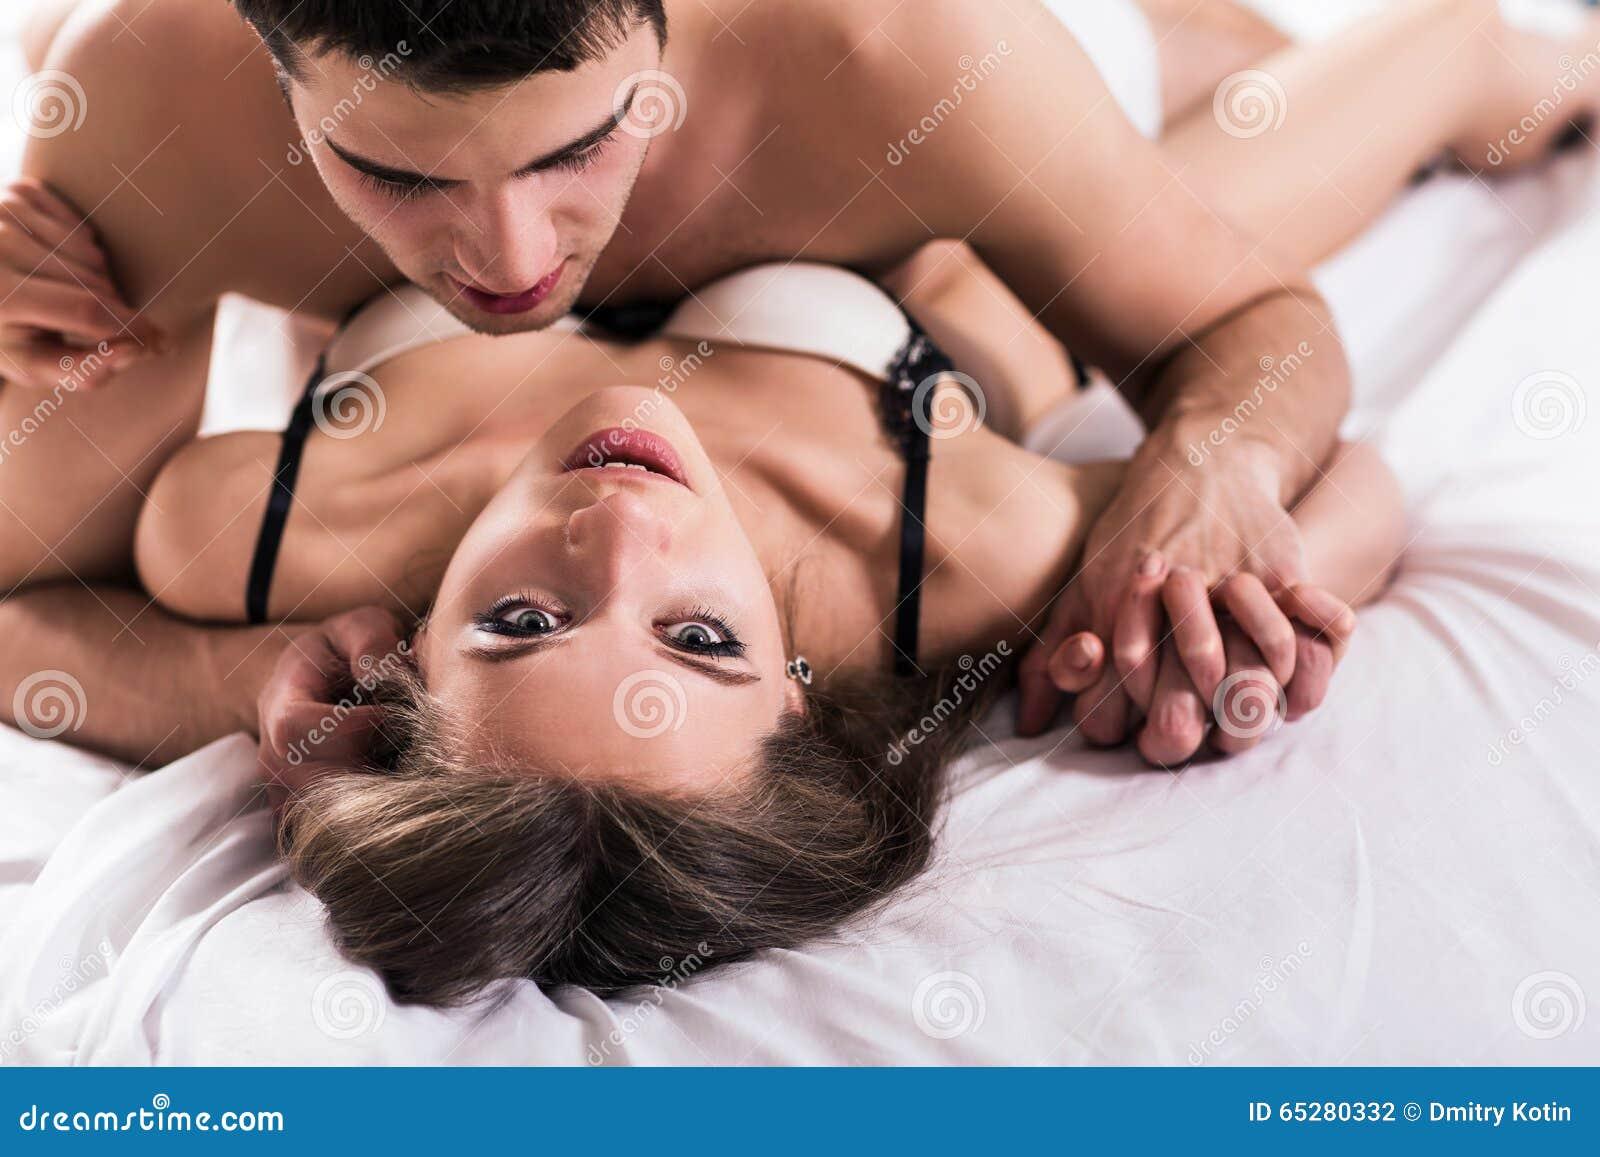 kissing Sex romantic couple